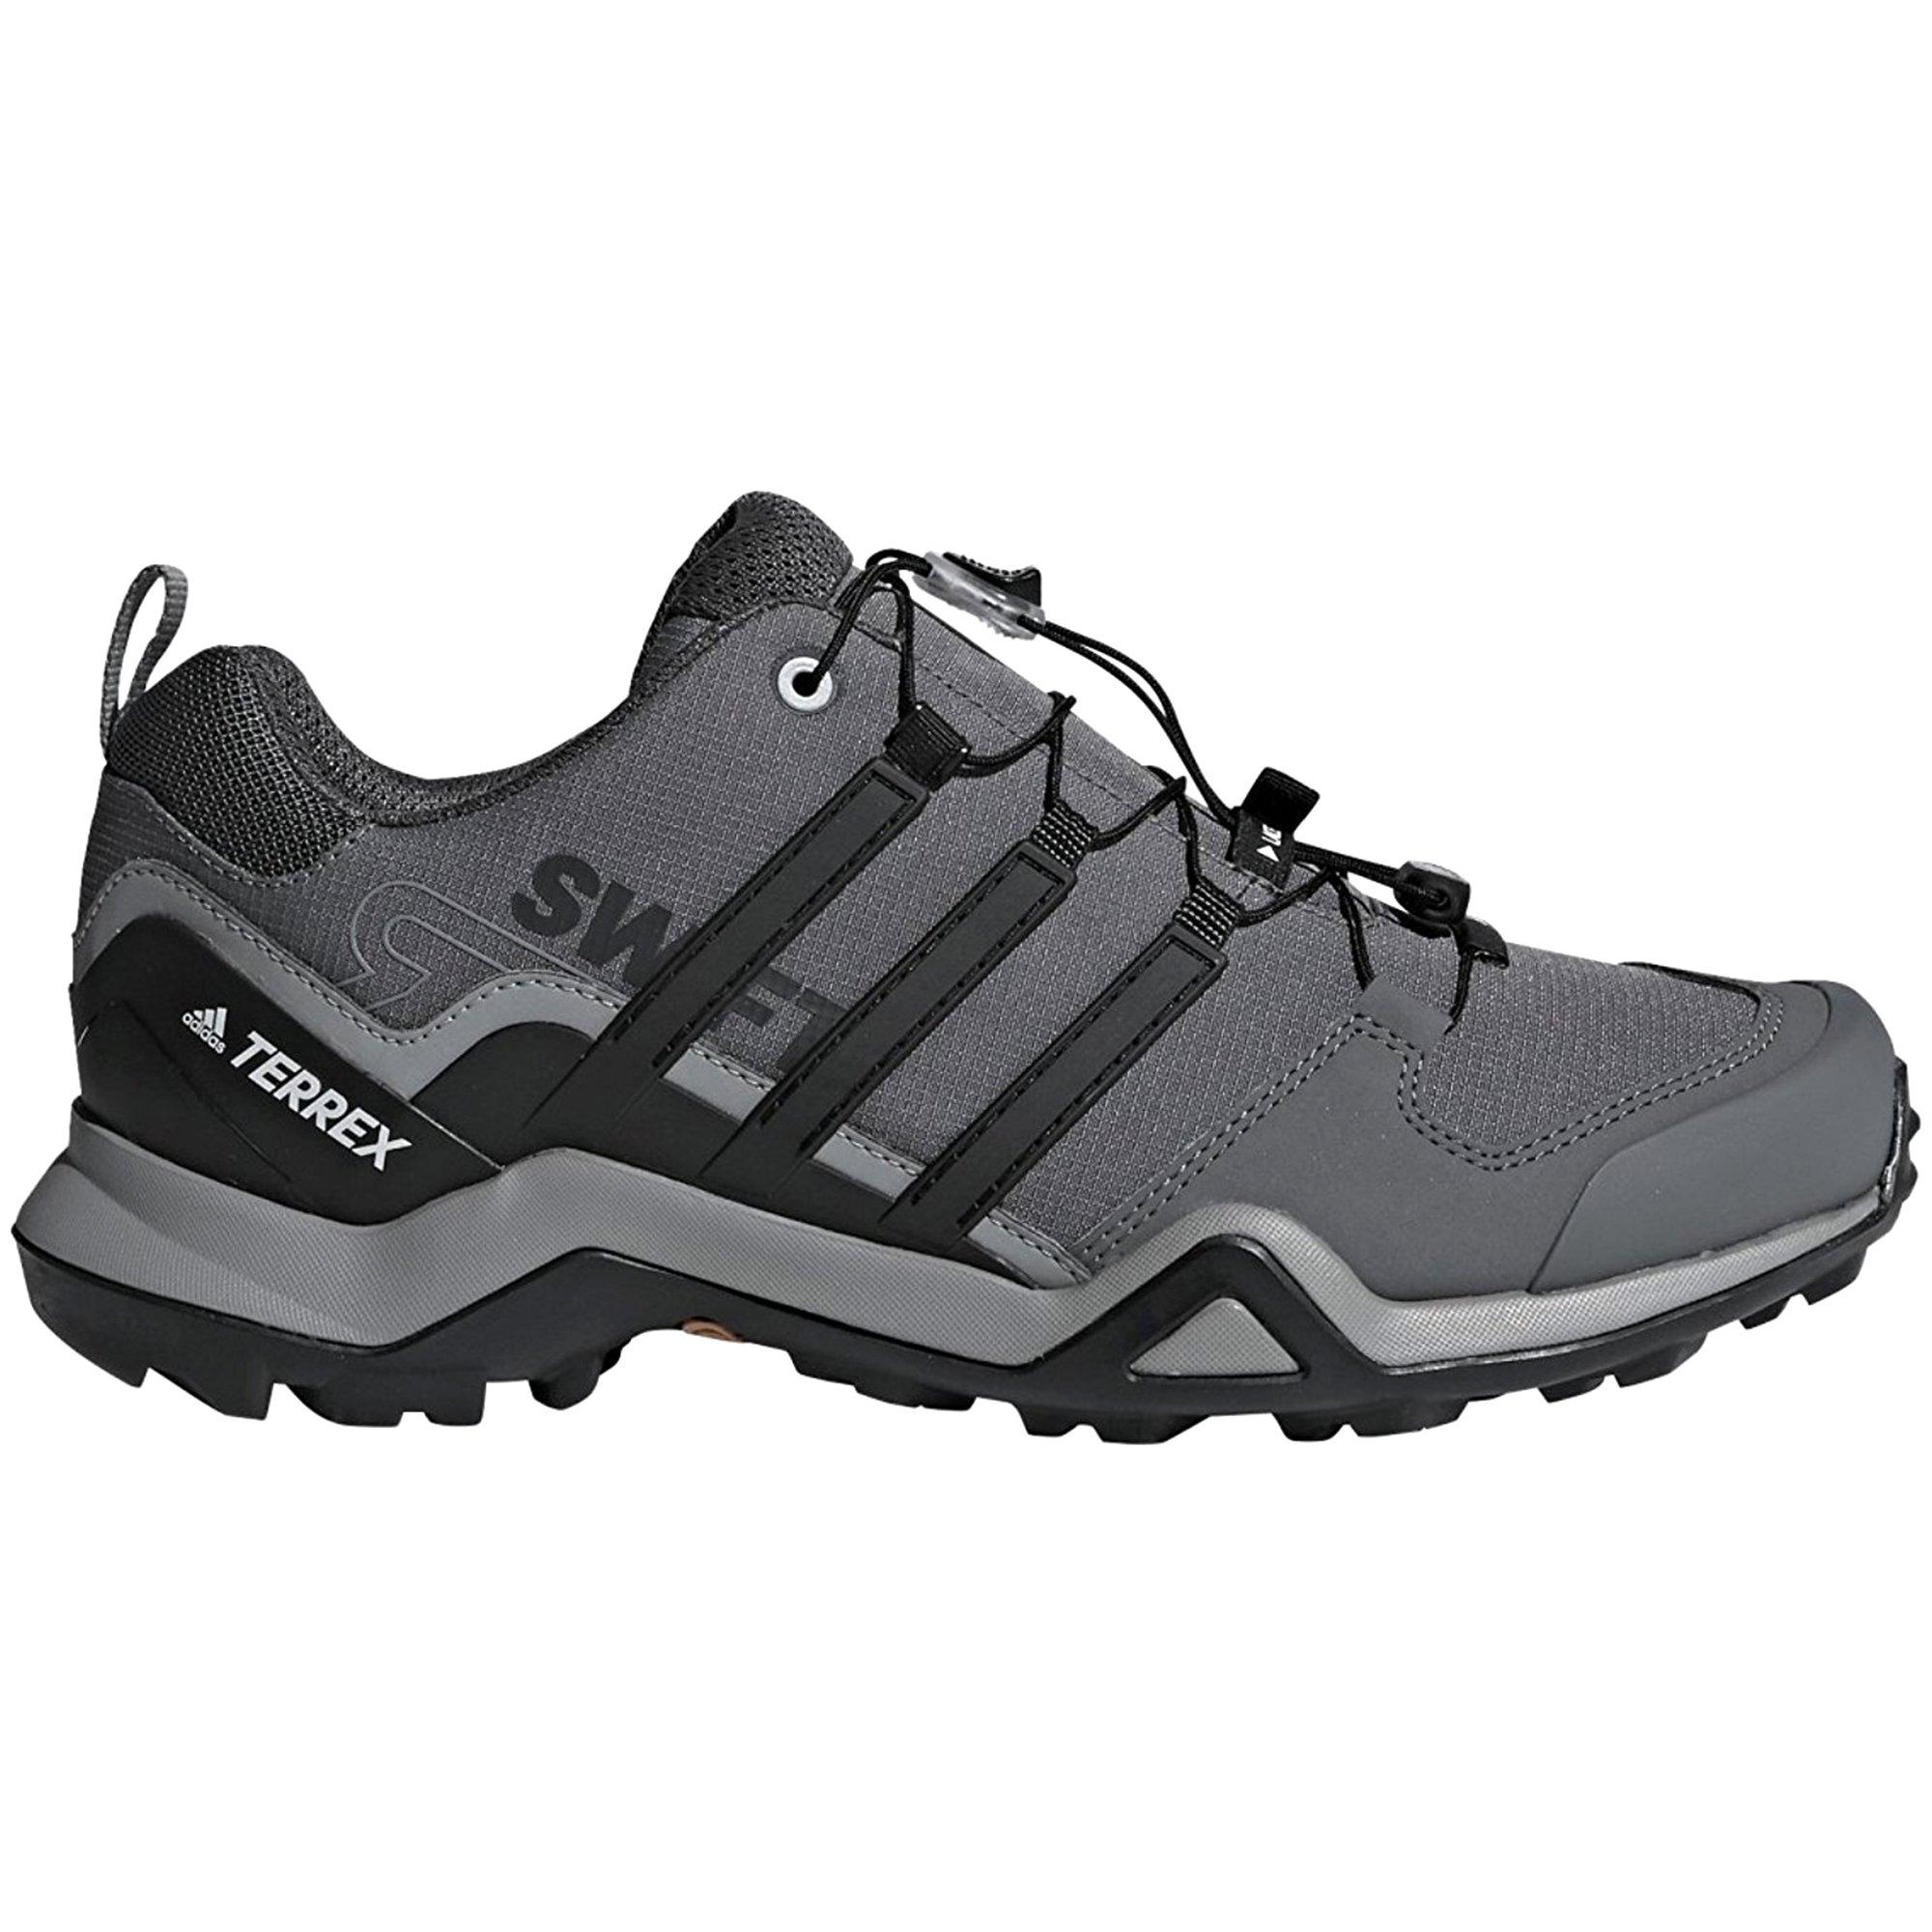 adidas outdoor Terrex Swift R2 Hiking Shoe - Men's Grey Three/Black/Grey Five, 11.5